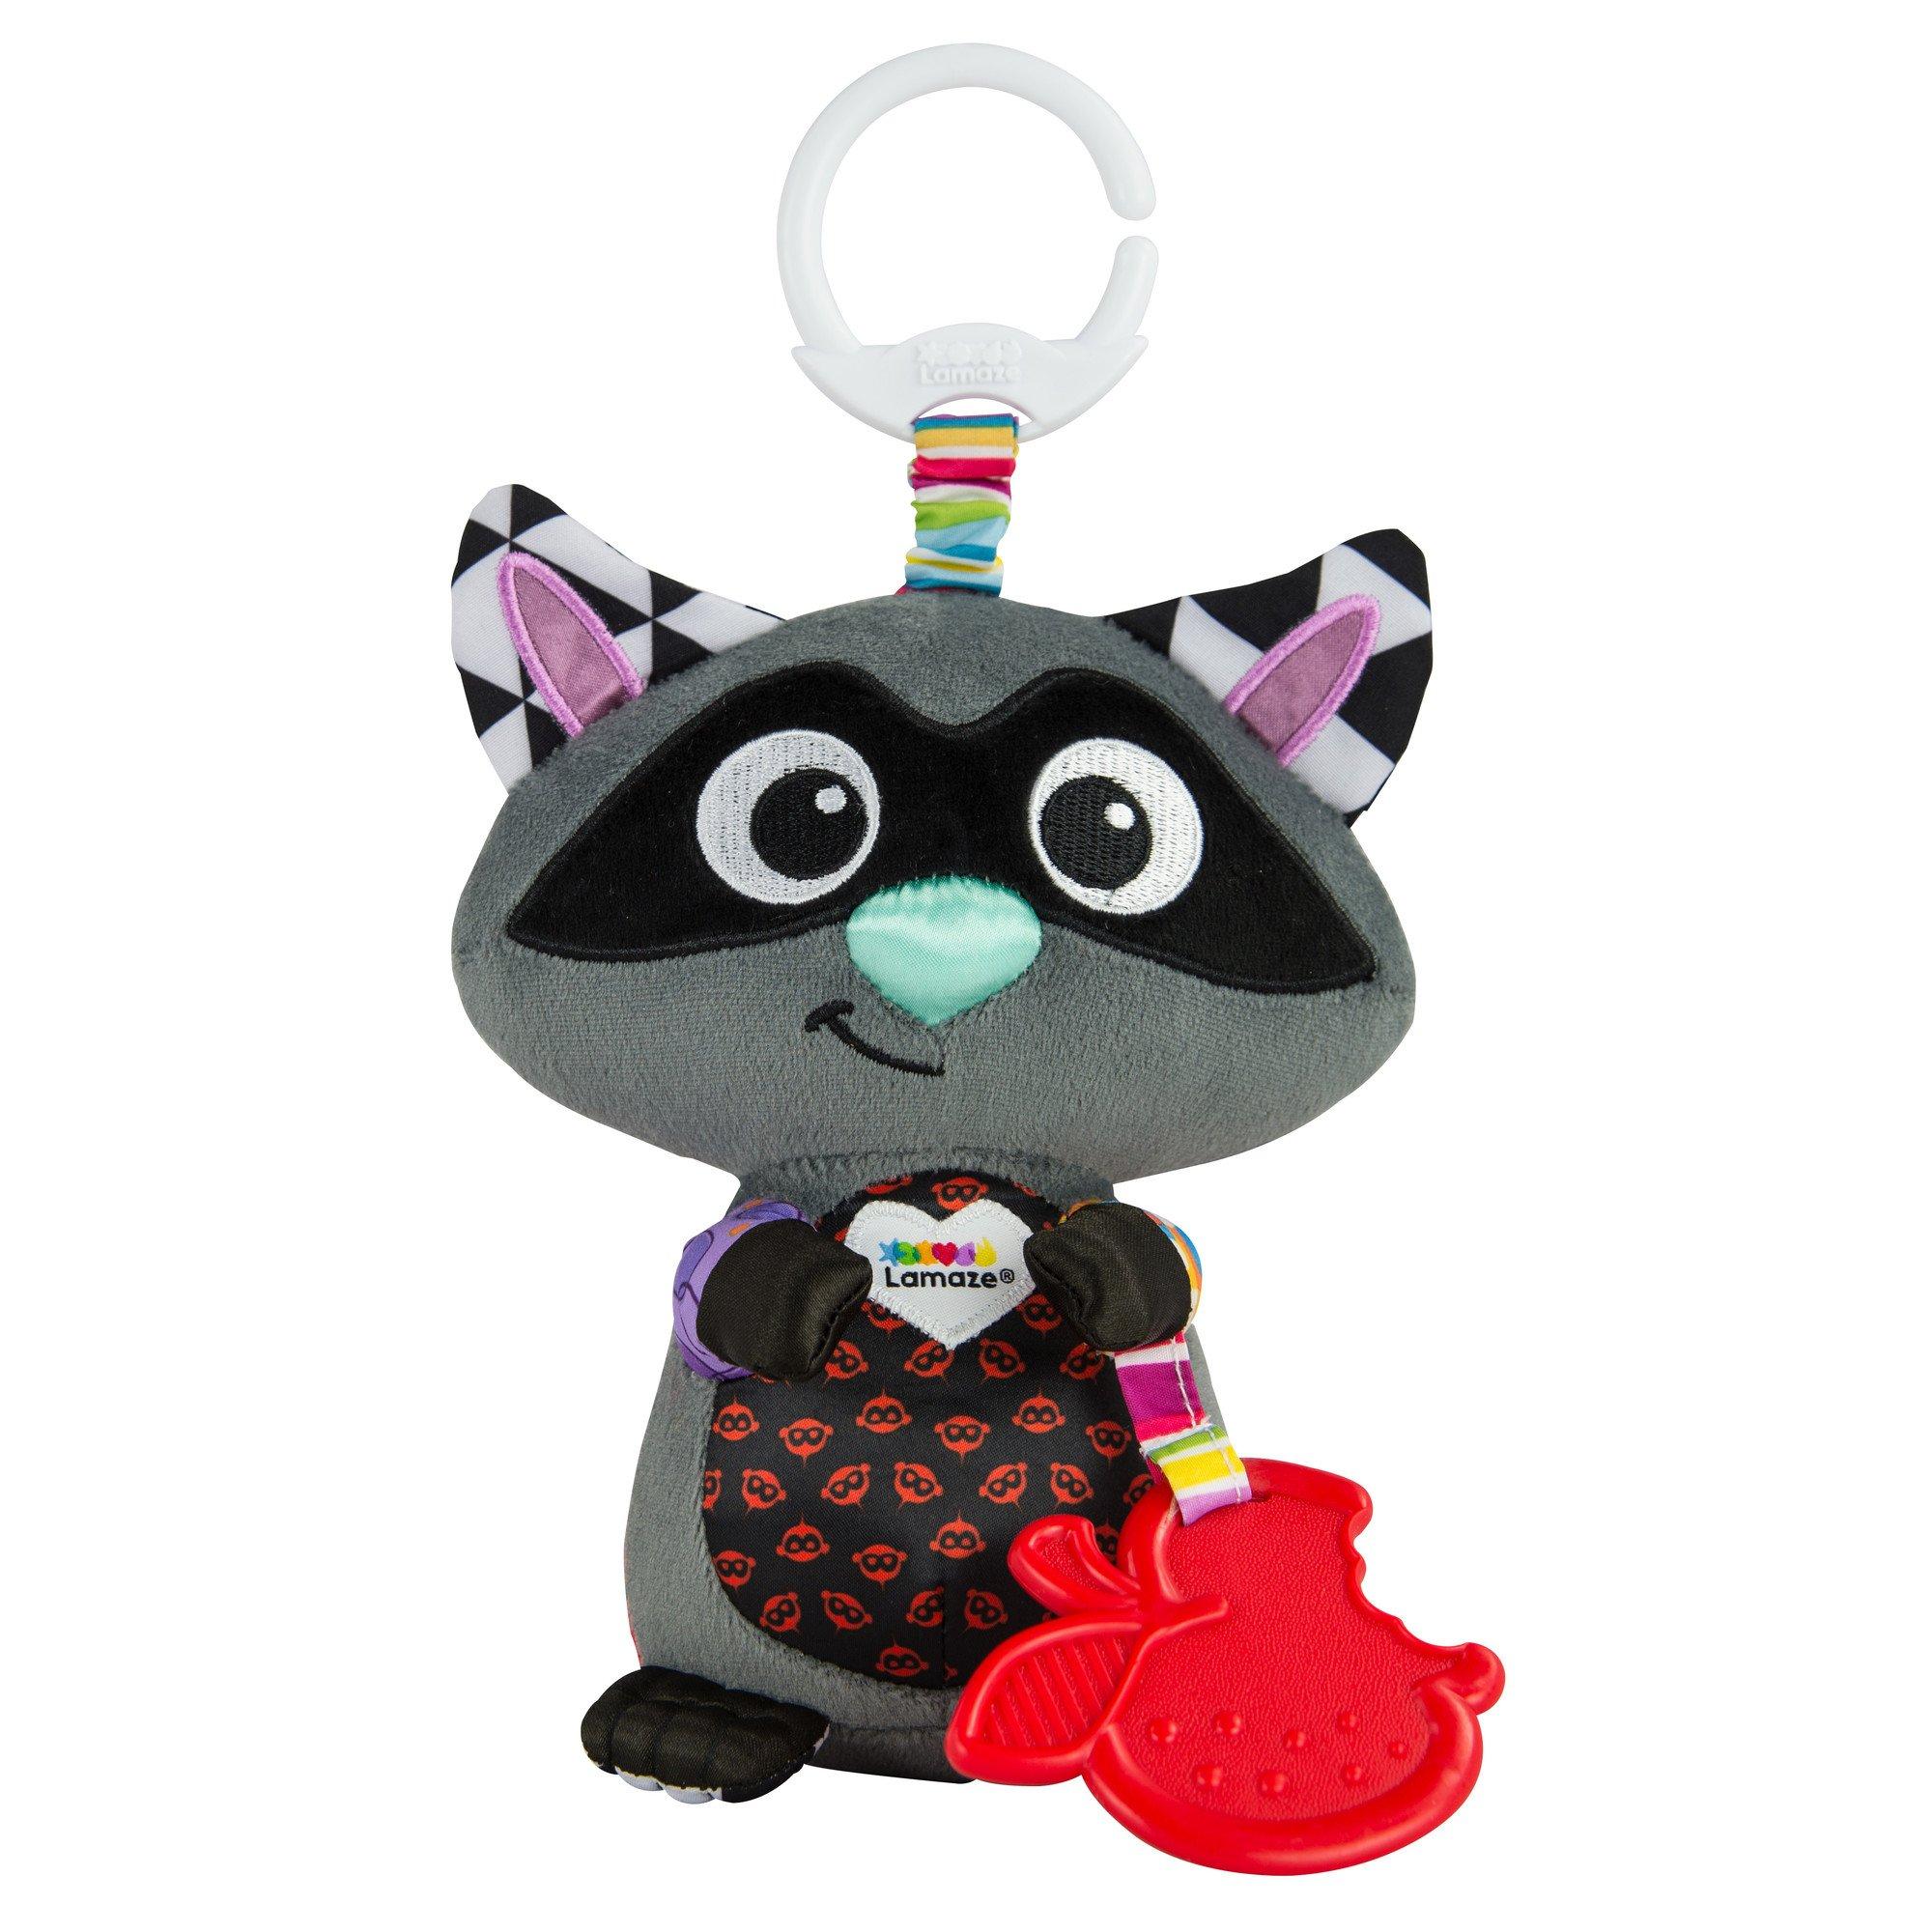 Lamaze Disney/Pixar Clip & Go, Raccoon